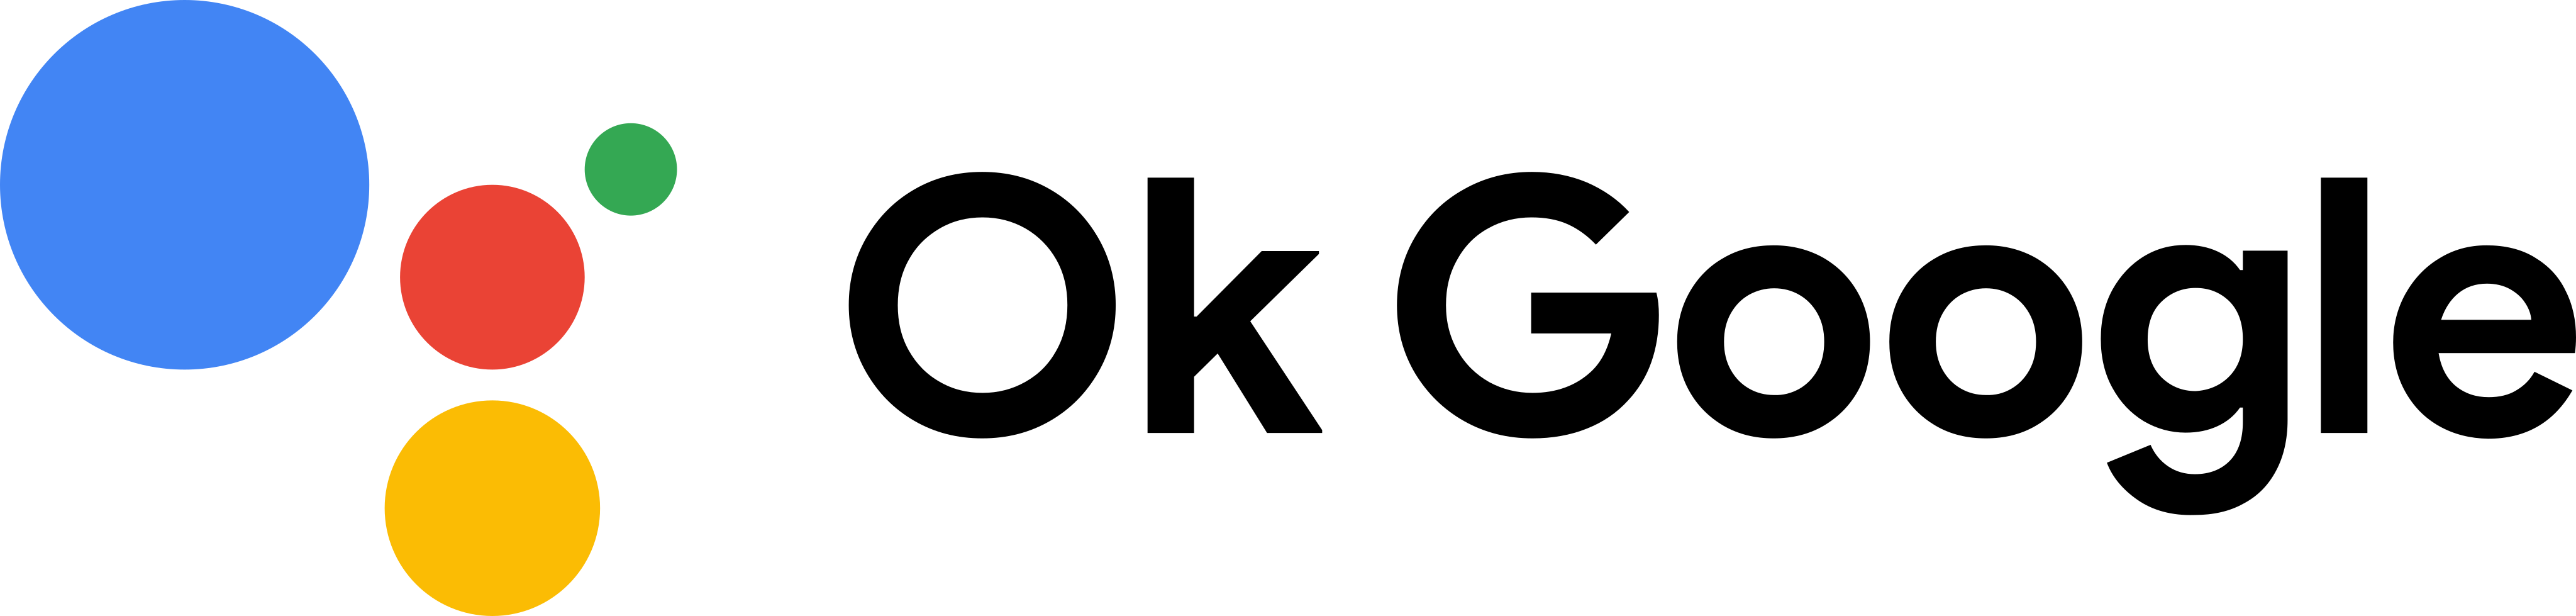 ok google logo - Ok Google Logo